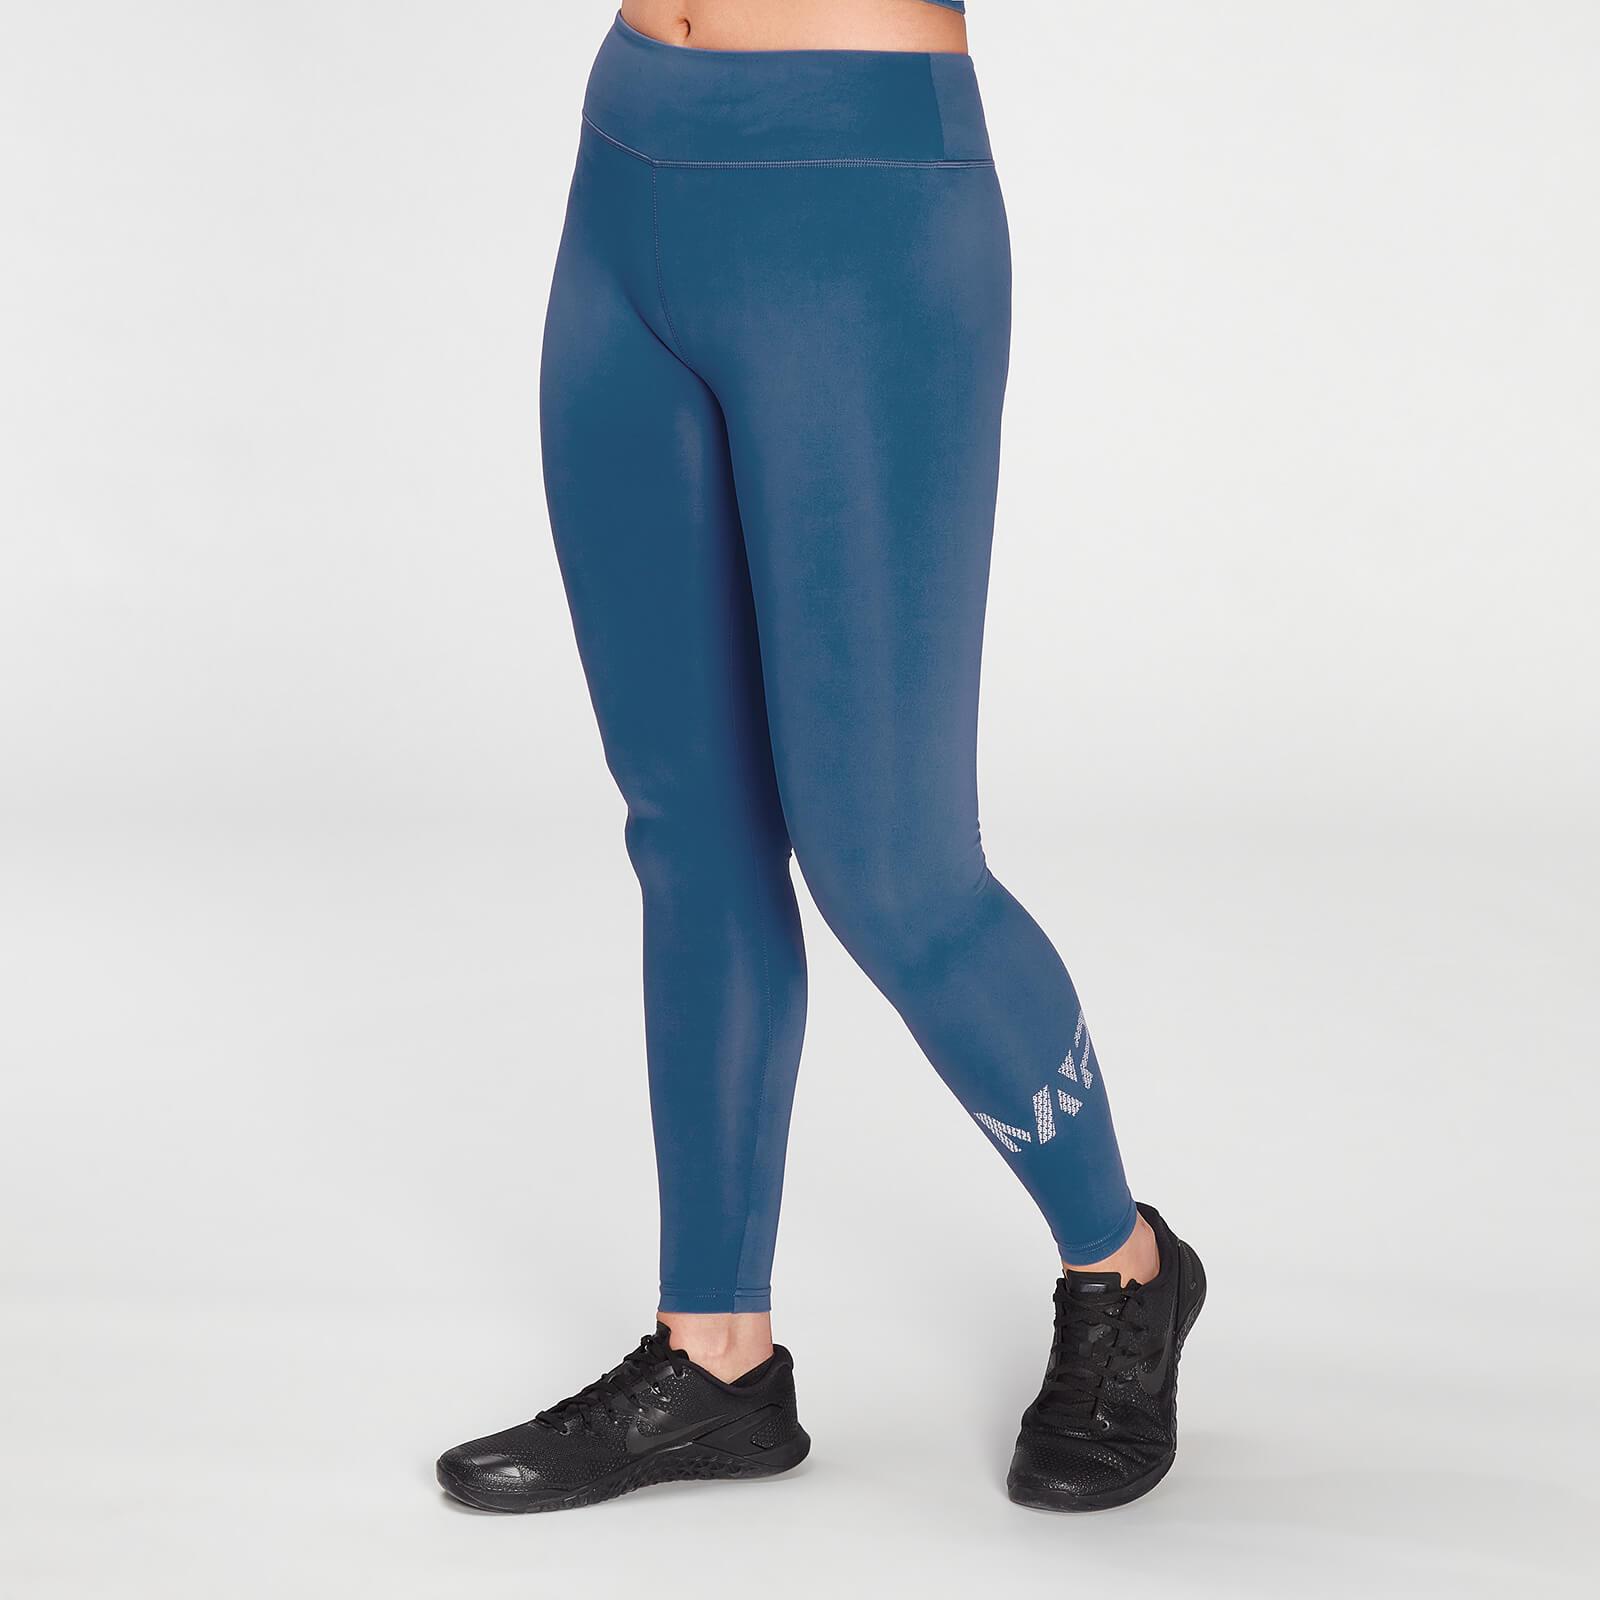 Mp Women's Essentials Printed Training Leggings - Pilot Blue - S Mpw590pilotblue Mens Sportswear, Blue